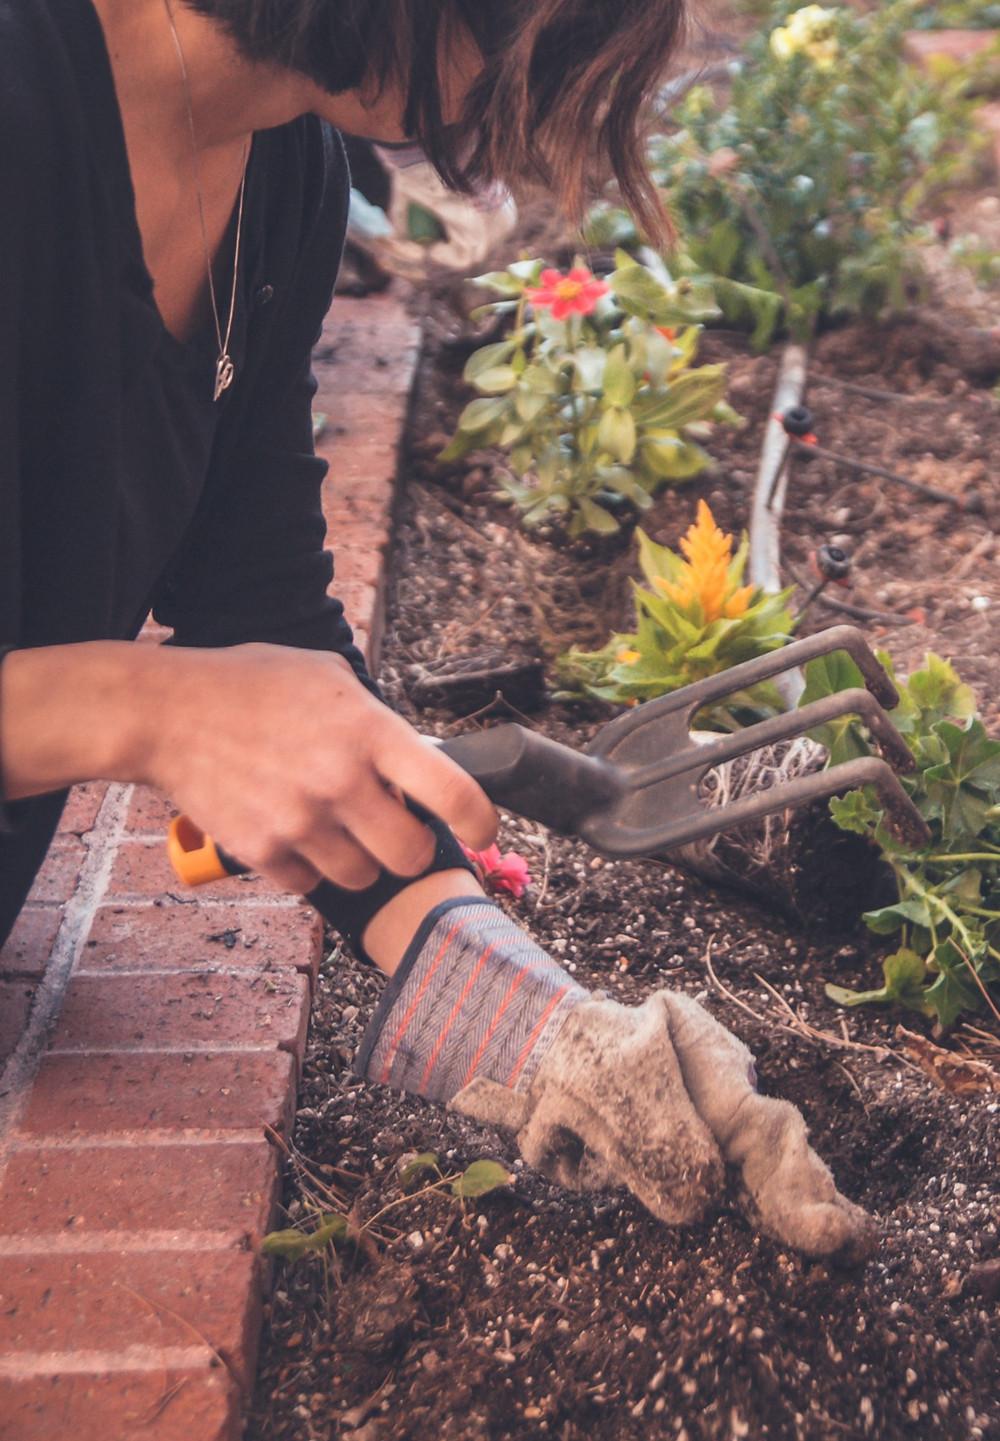 mulher mexendo na terra do jardim